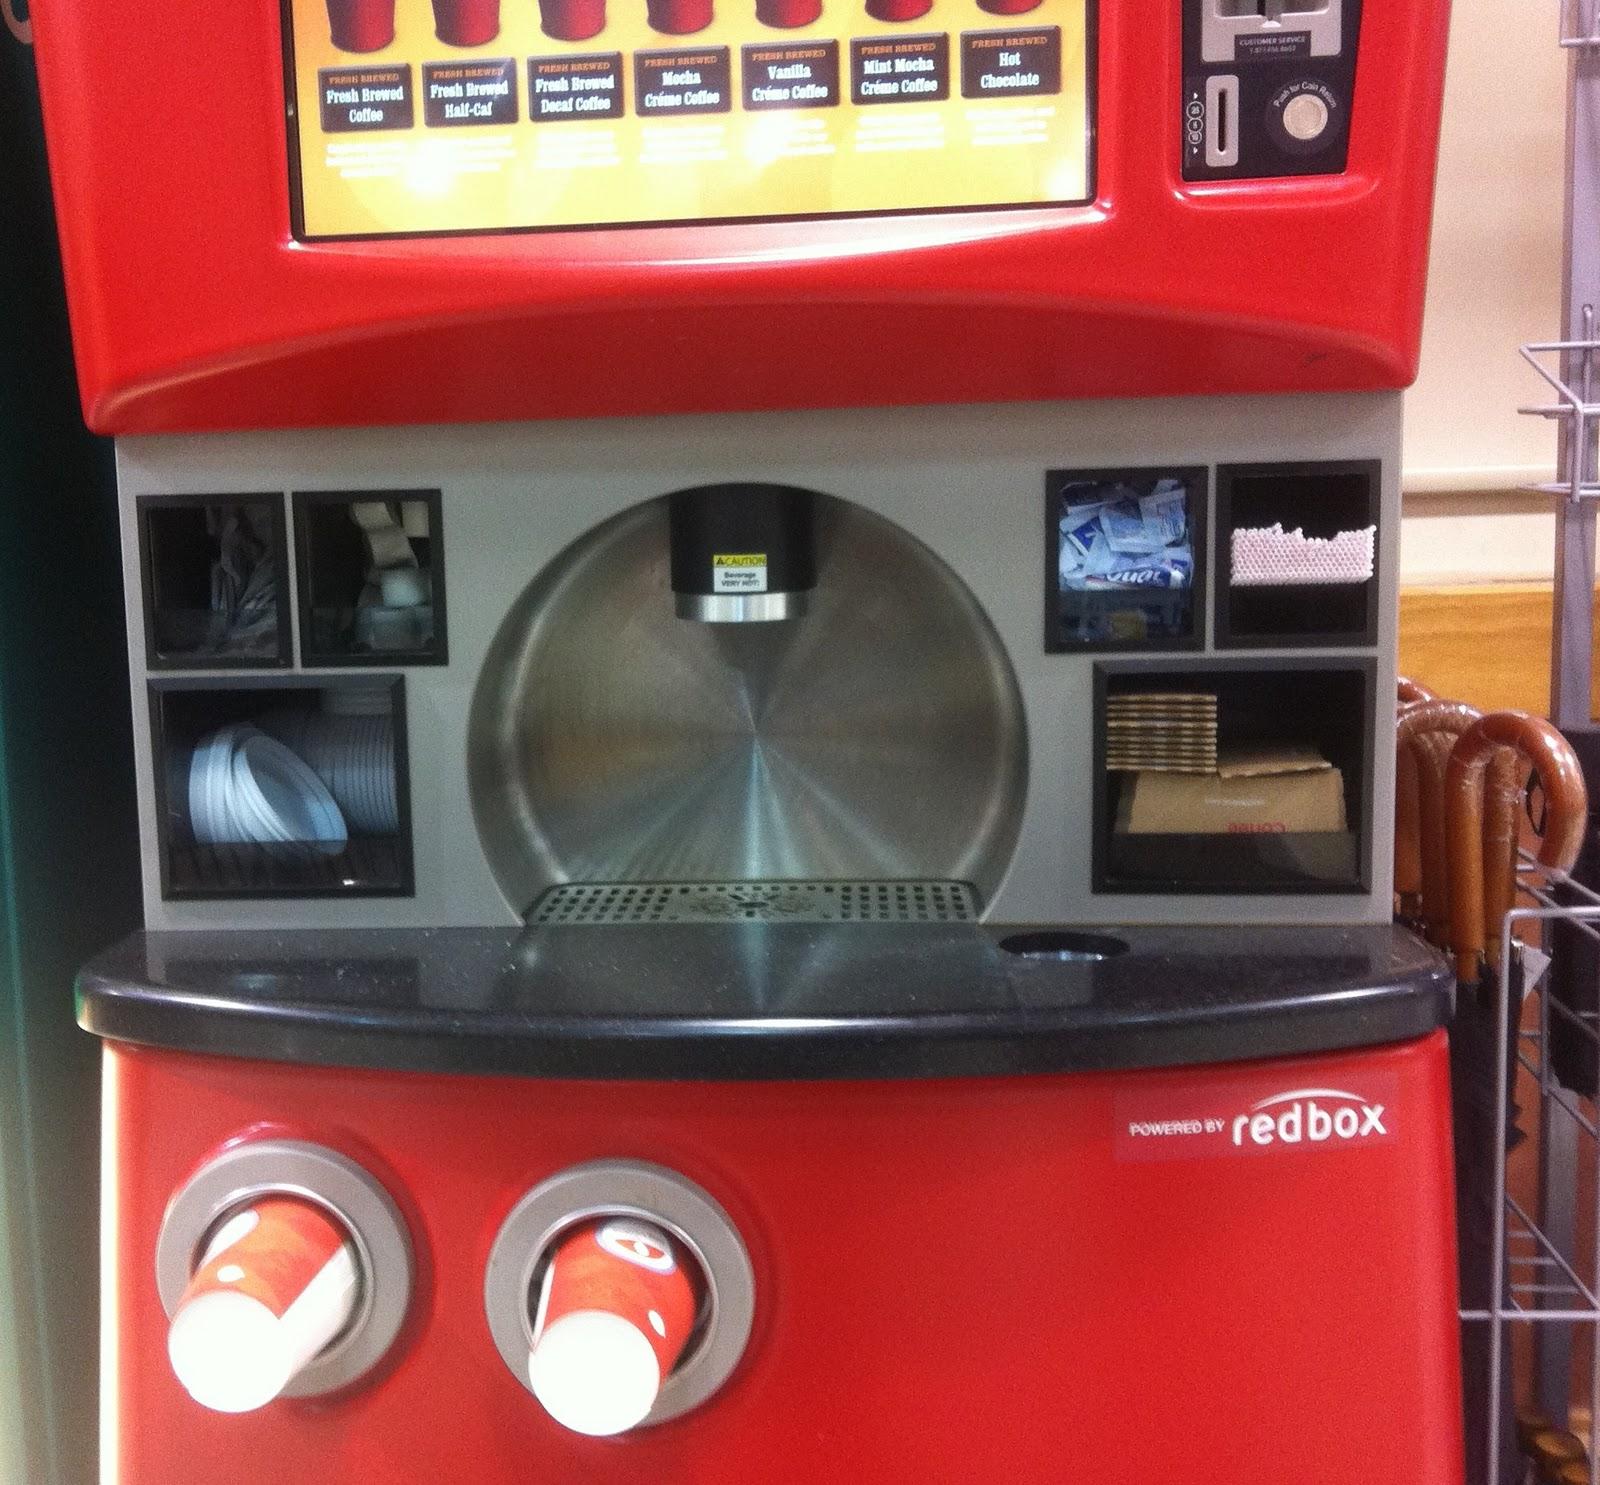 Coffee kiosks from Coinstar: More than 500 kiosks expected ...